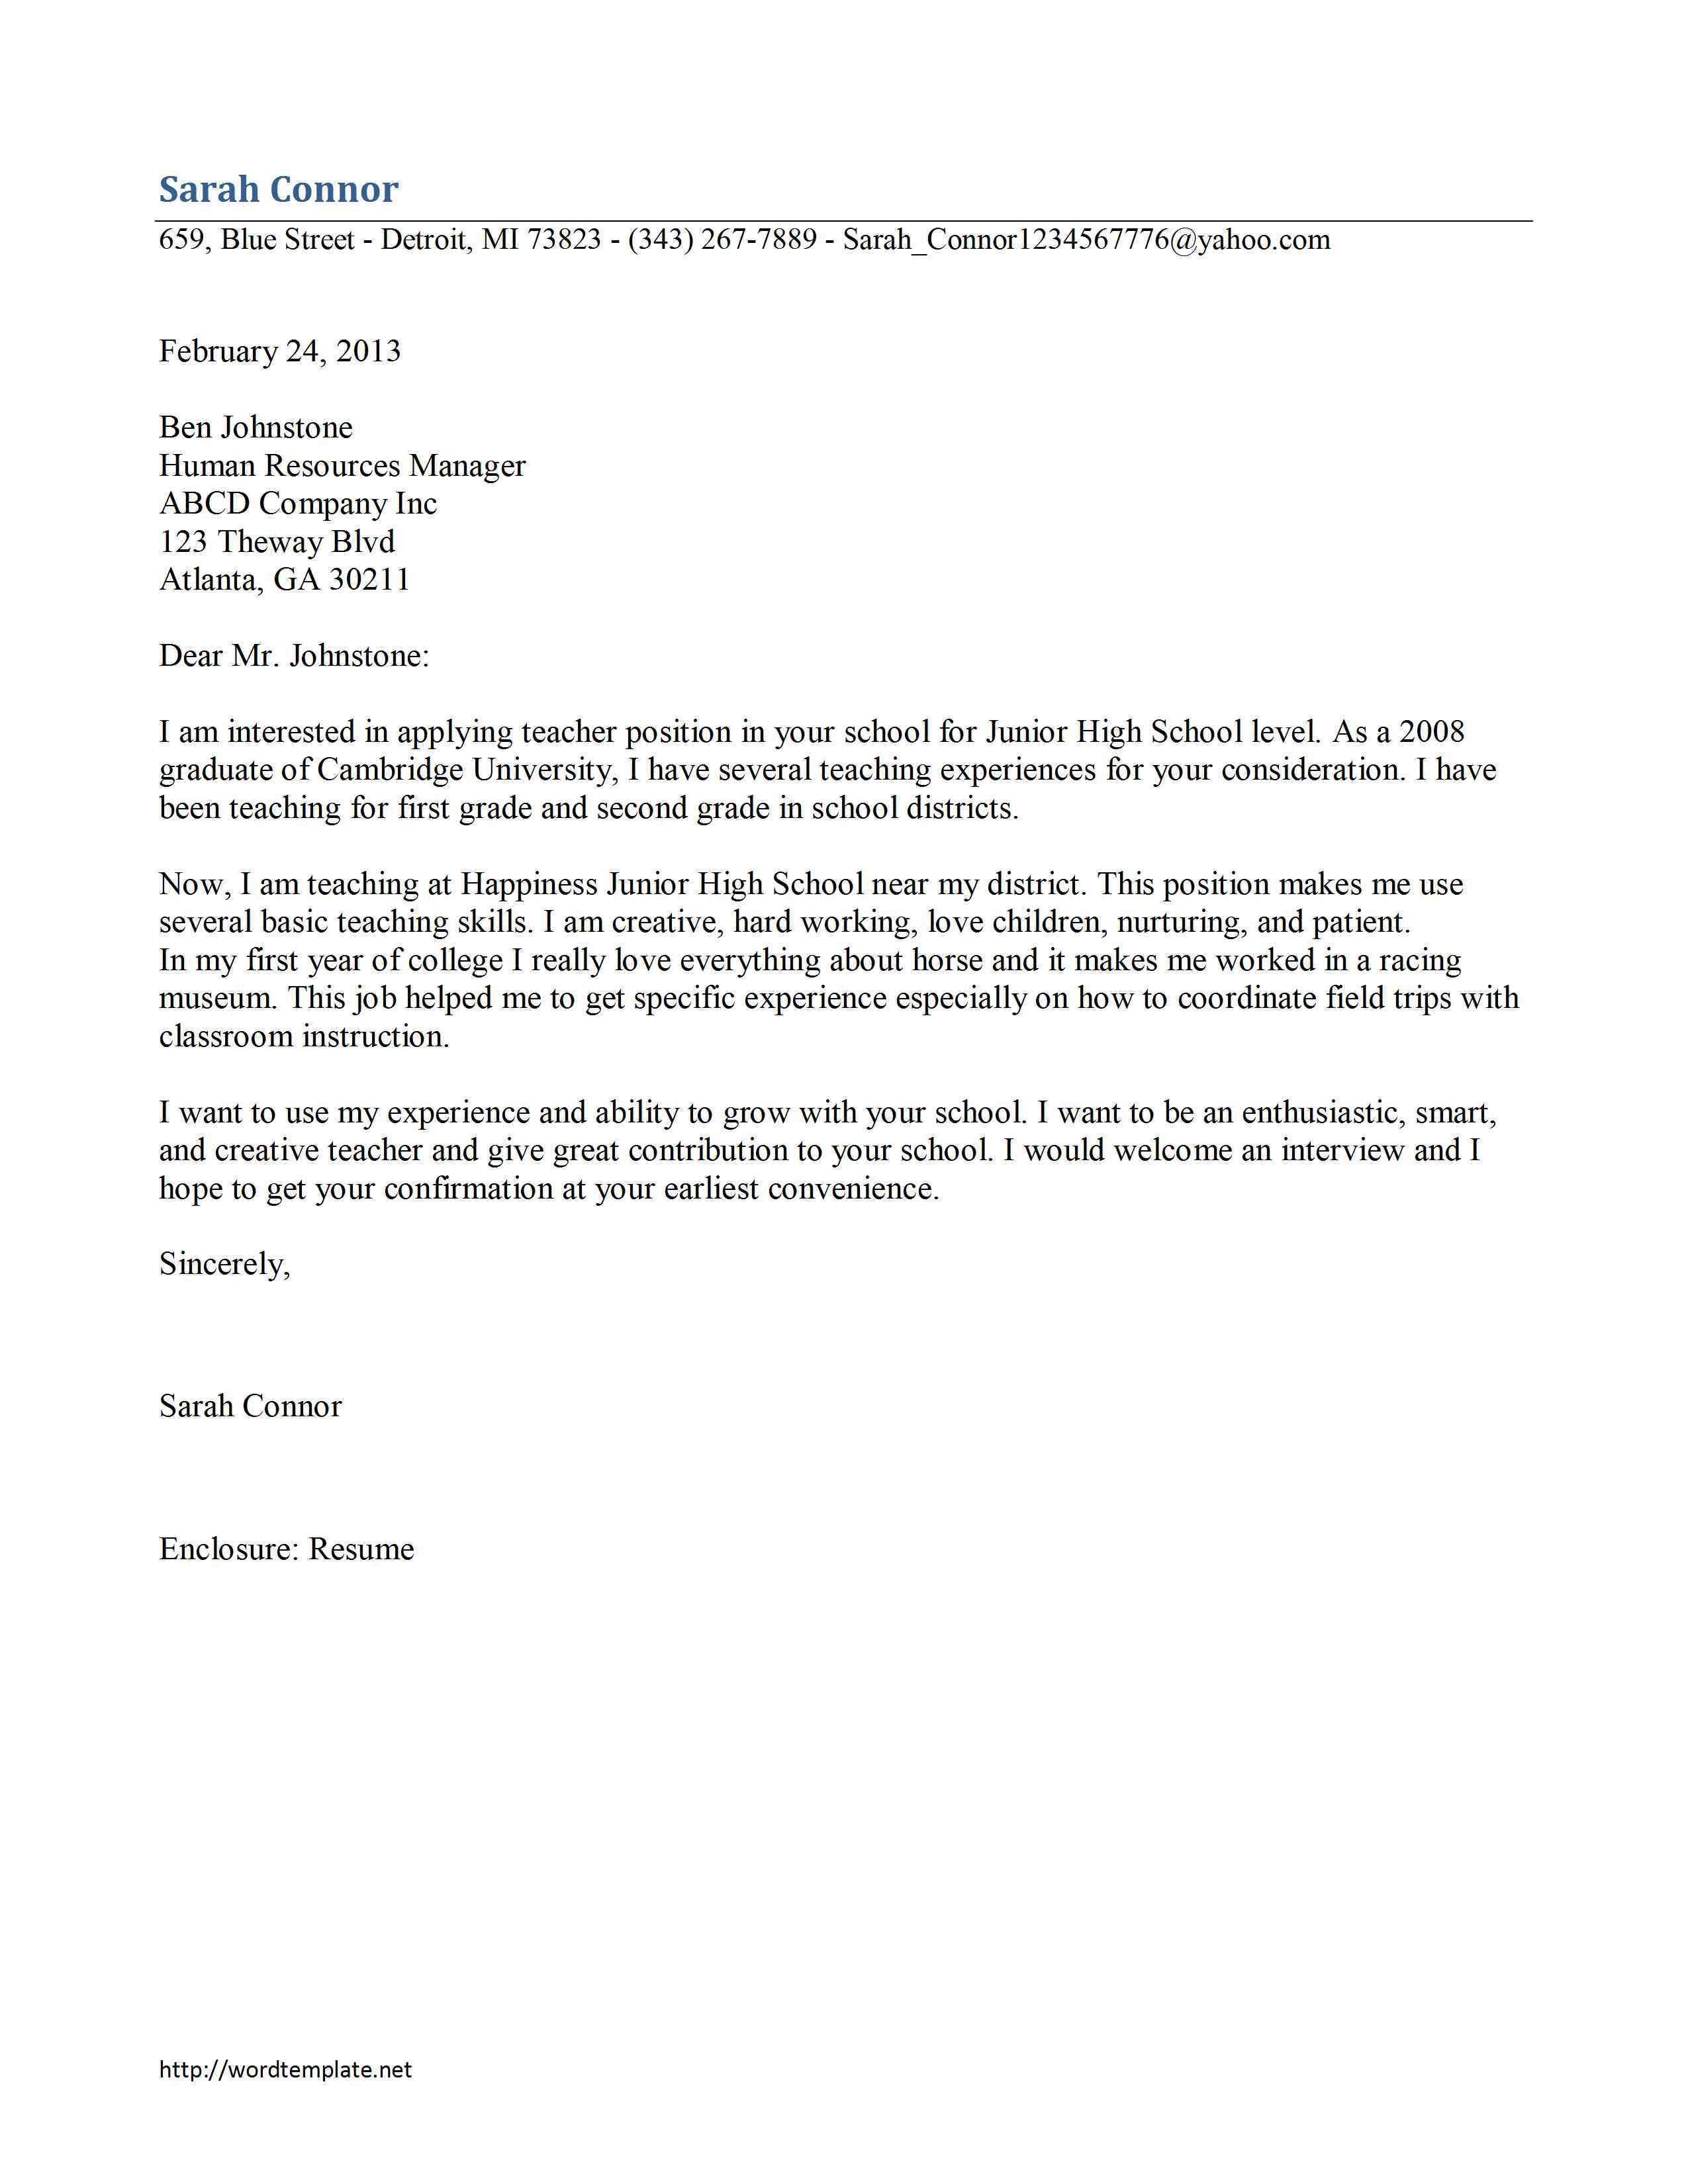 resume help penn state